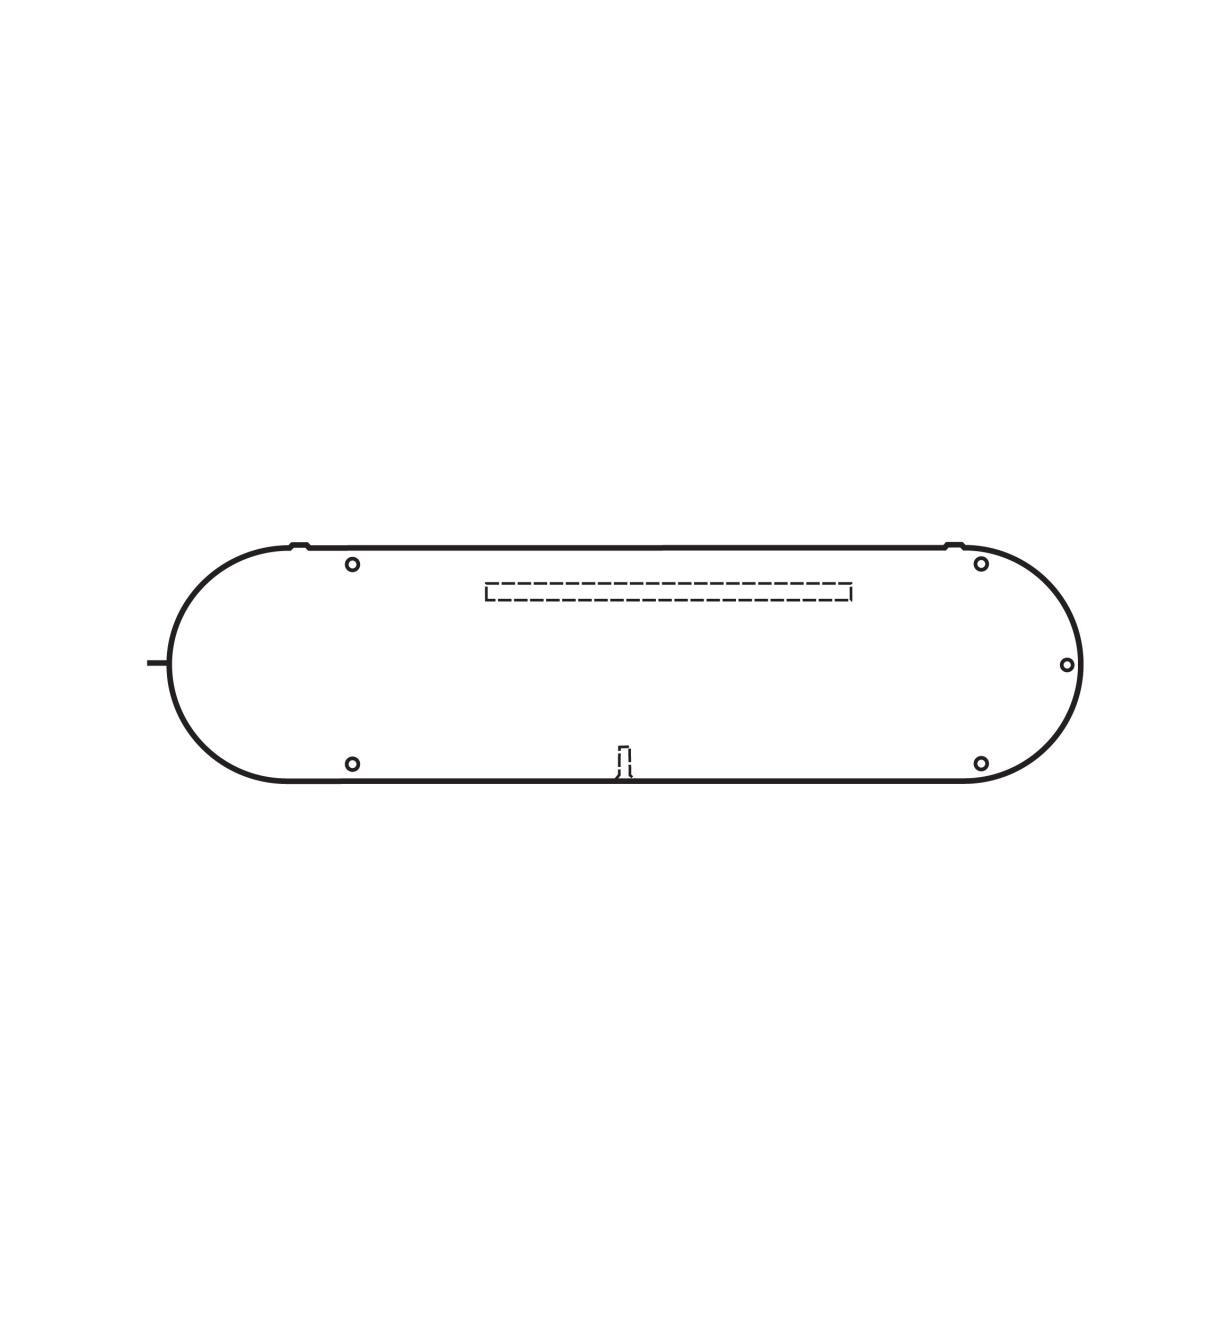 "46J8501 - Delta Throat Insert(3 3/4"" x 13 3/8"")"